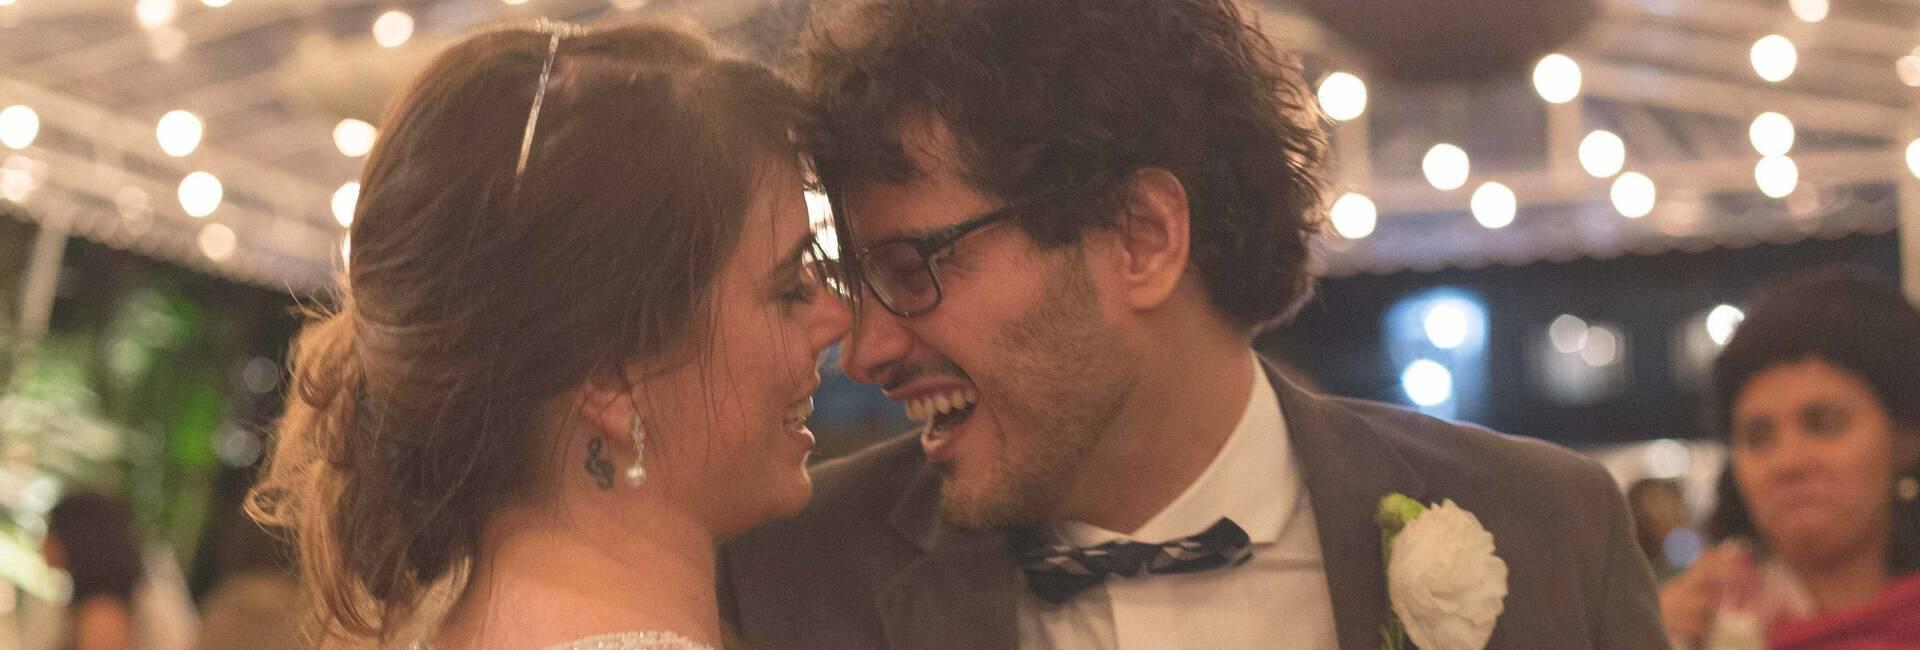 Casamentos de Rê + Léo